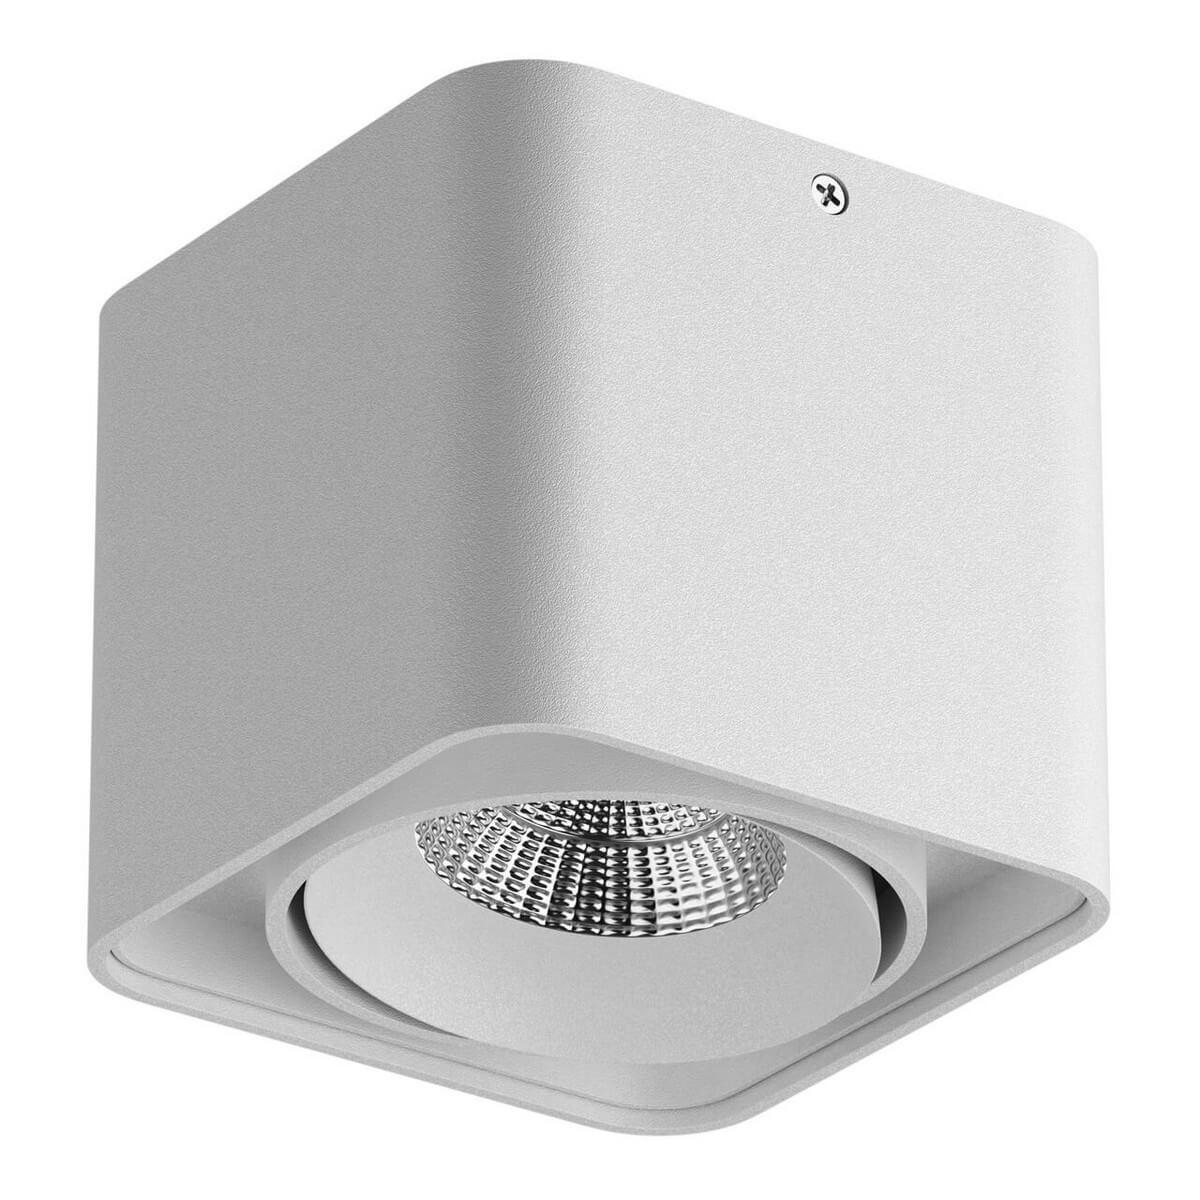 Накладной светильник Lightstar 052116, LED, 10 Вт lightstar 803523